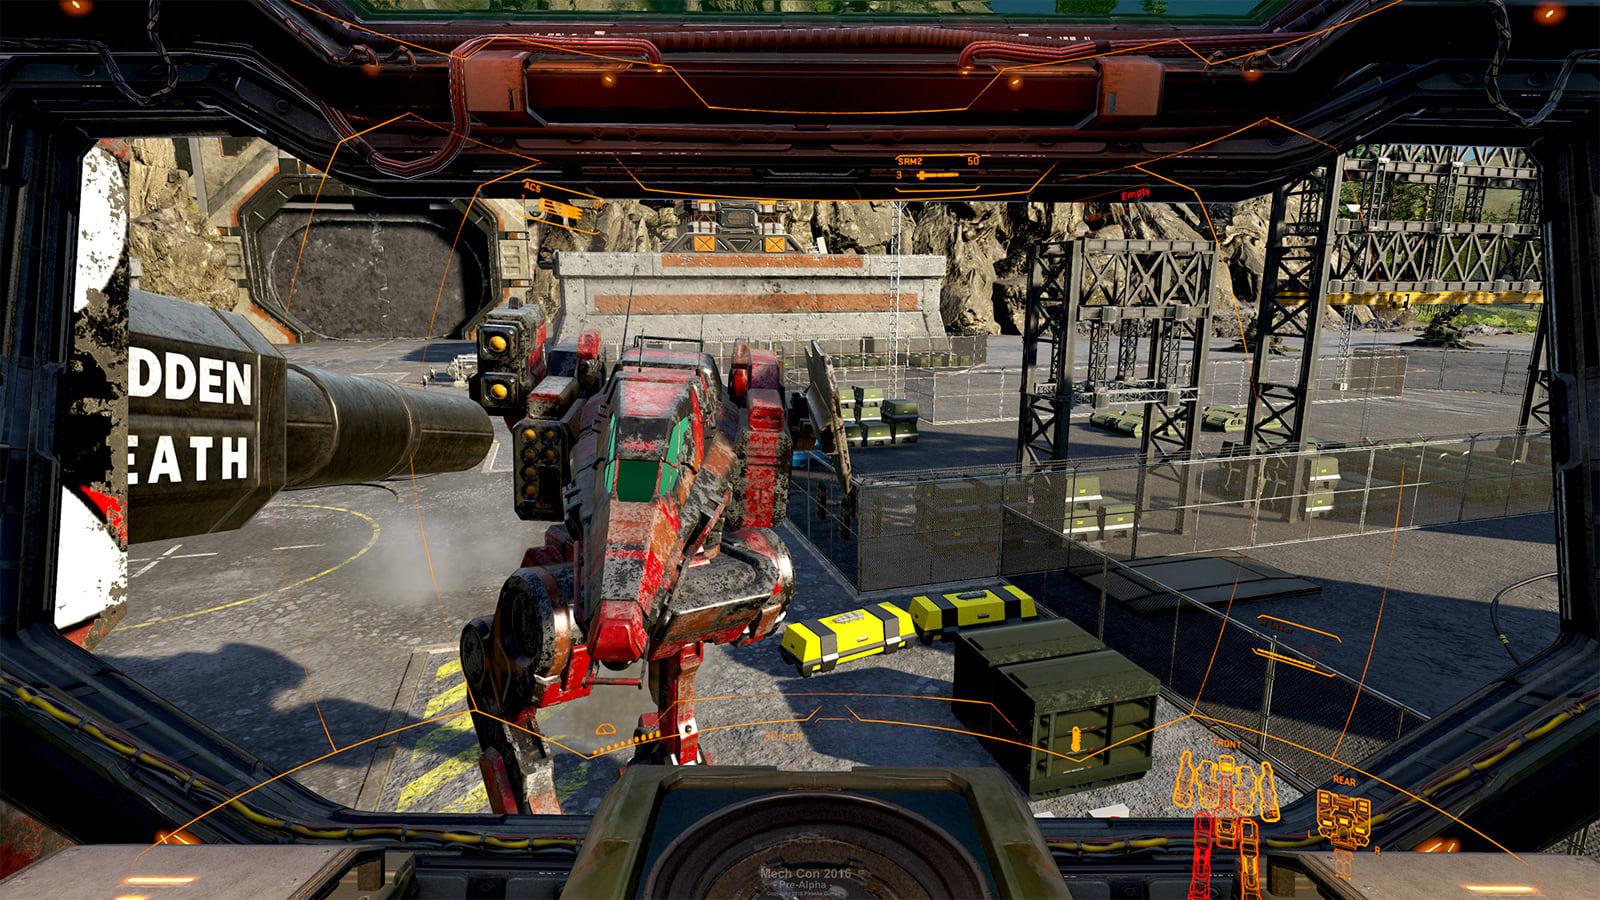 MechWarrior 5: Mercenaries' revives a classic series in 2018